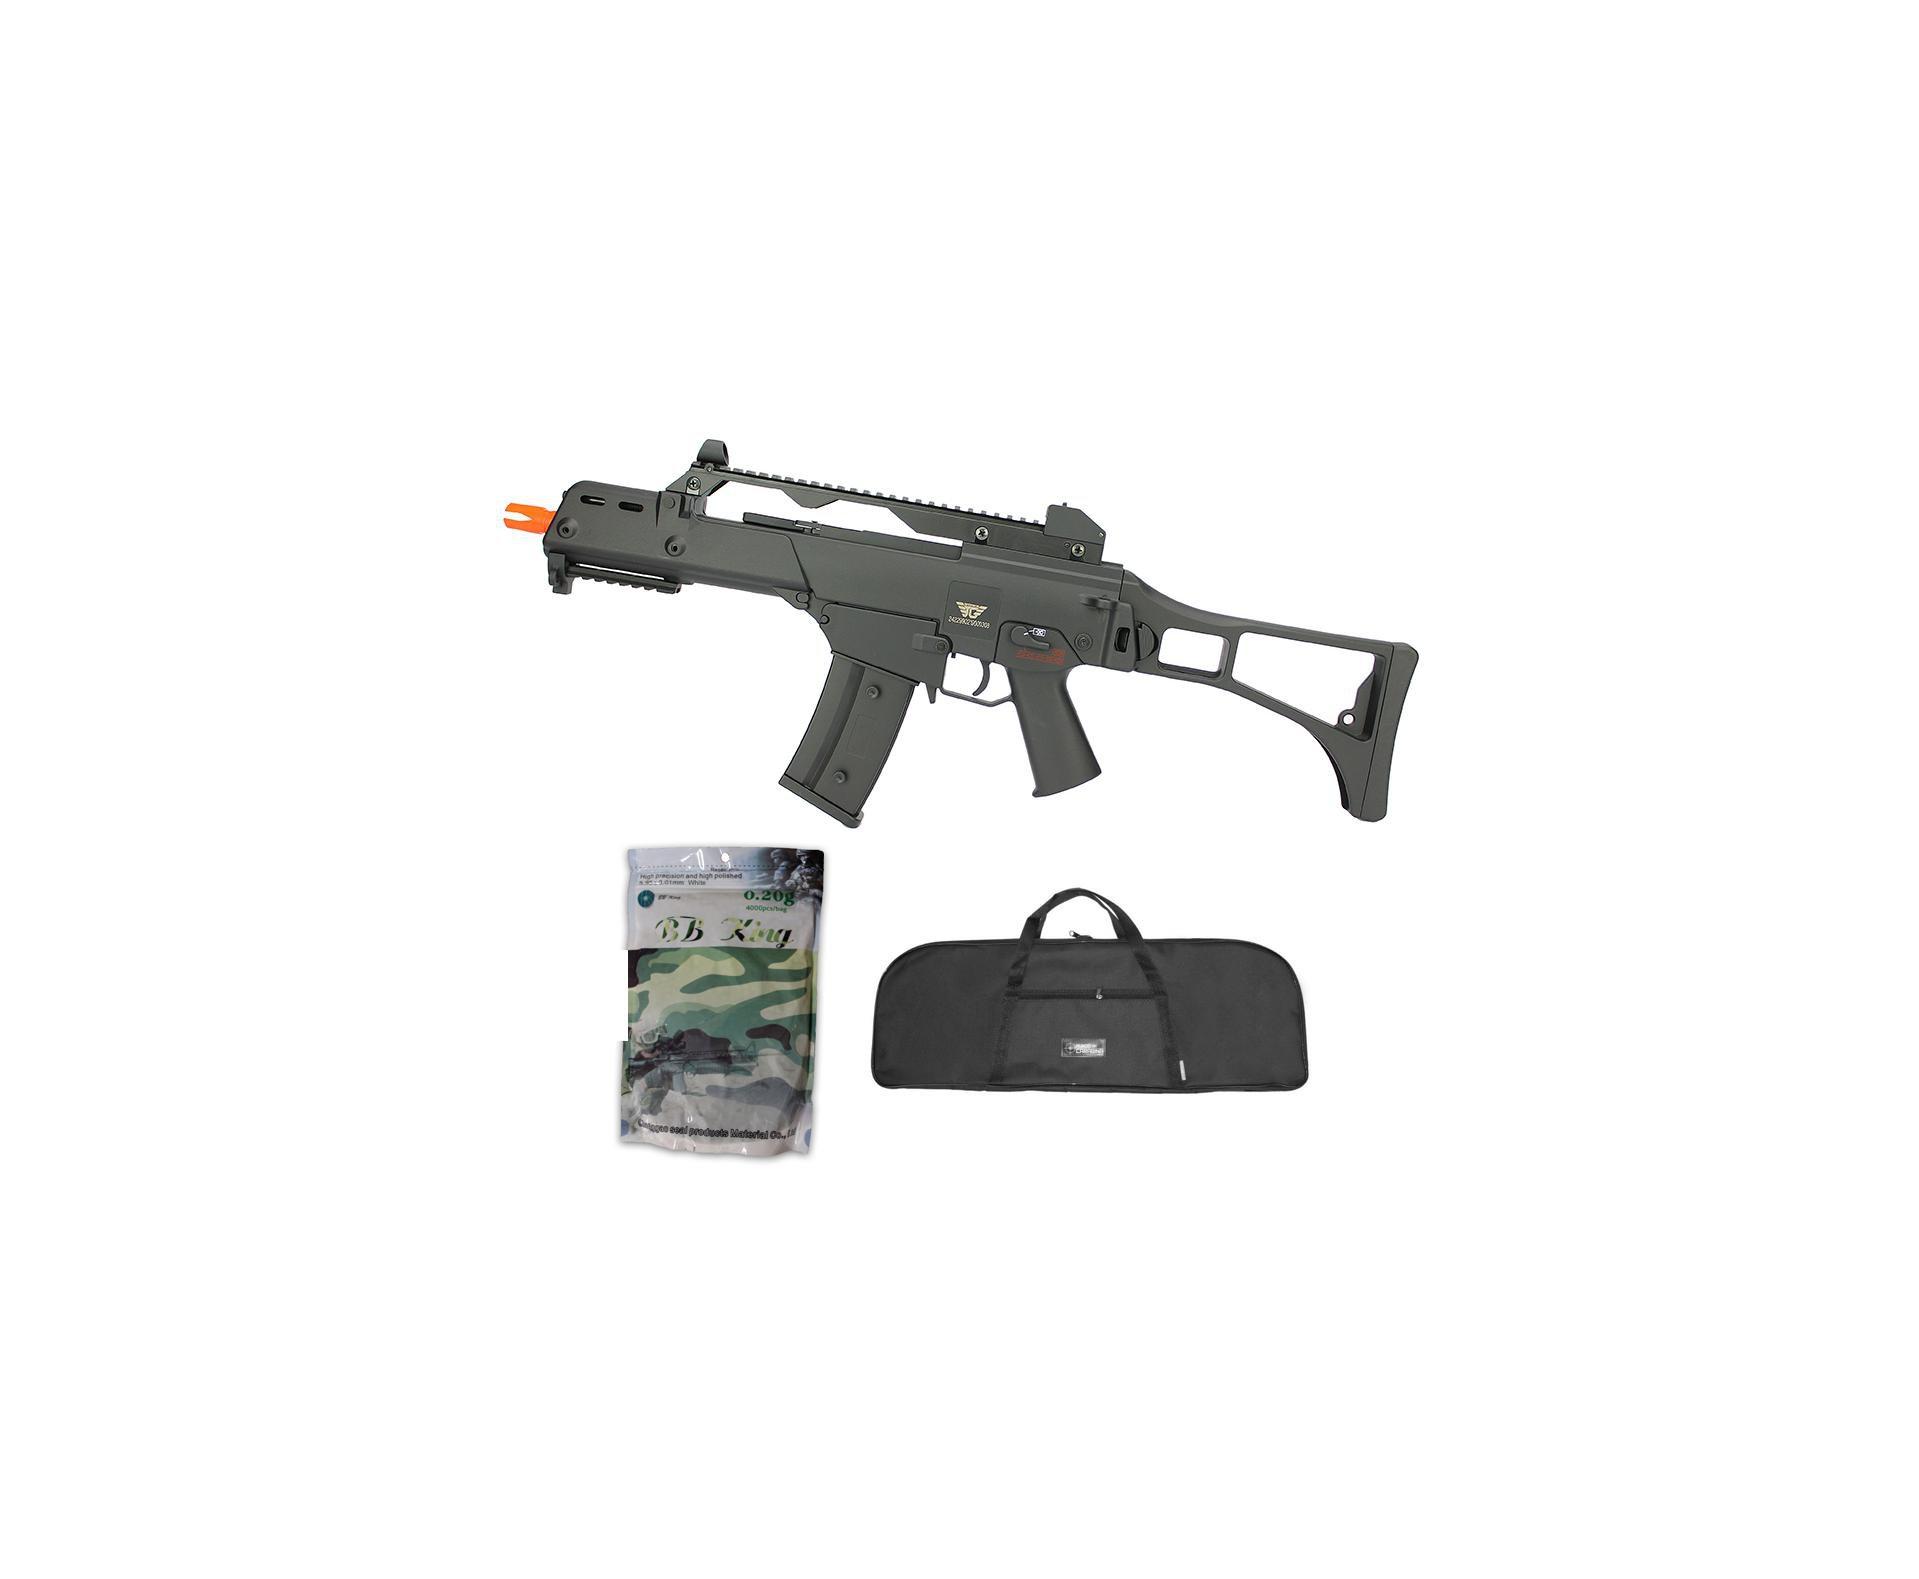 Rifle De Airsoft Aeg G36 Cal 6mm G608-0638 Jing Gong + Capa Simples + Esfera Plastica 0,20g 4000uni